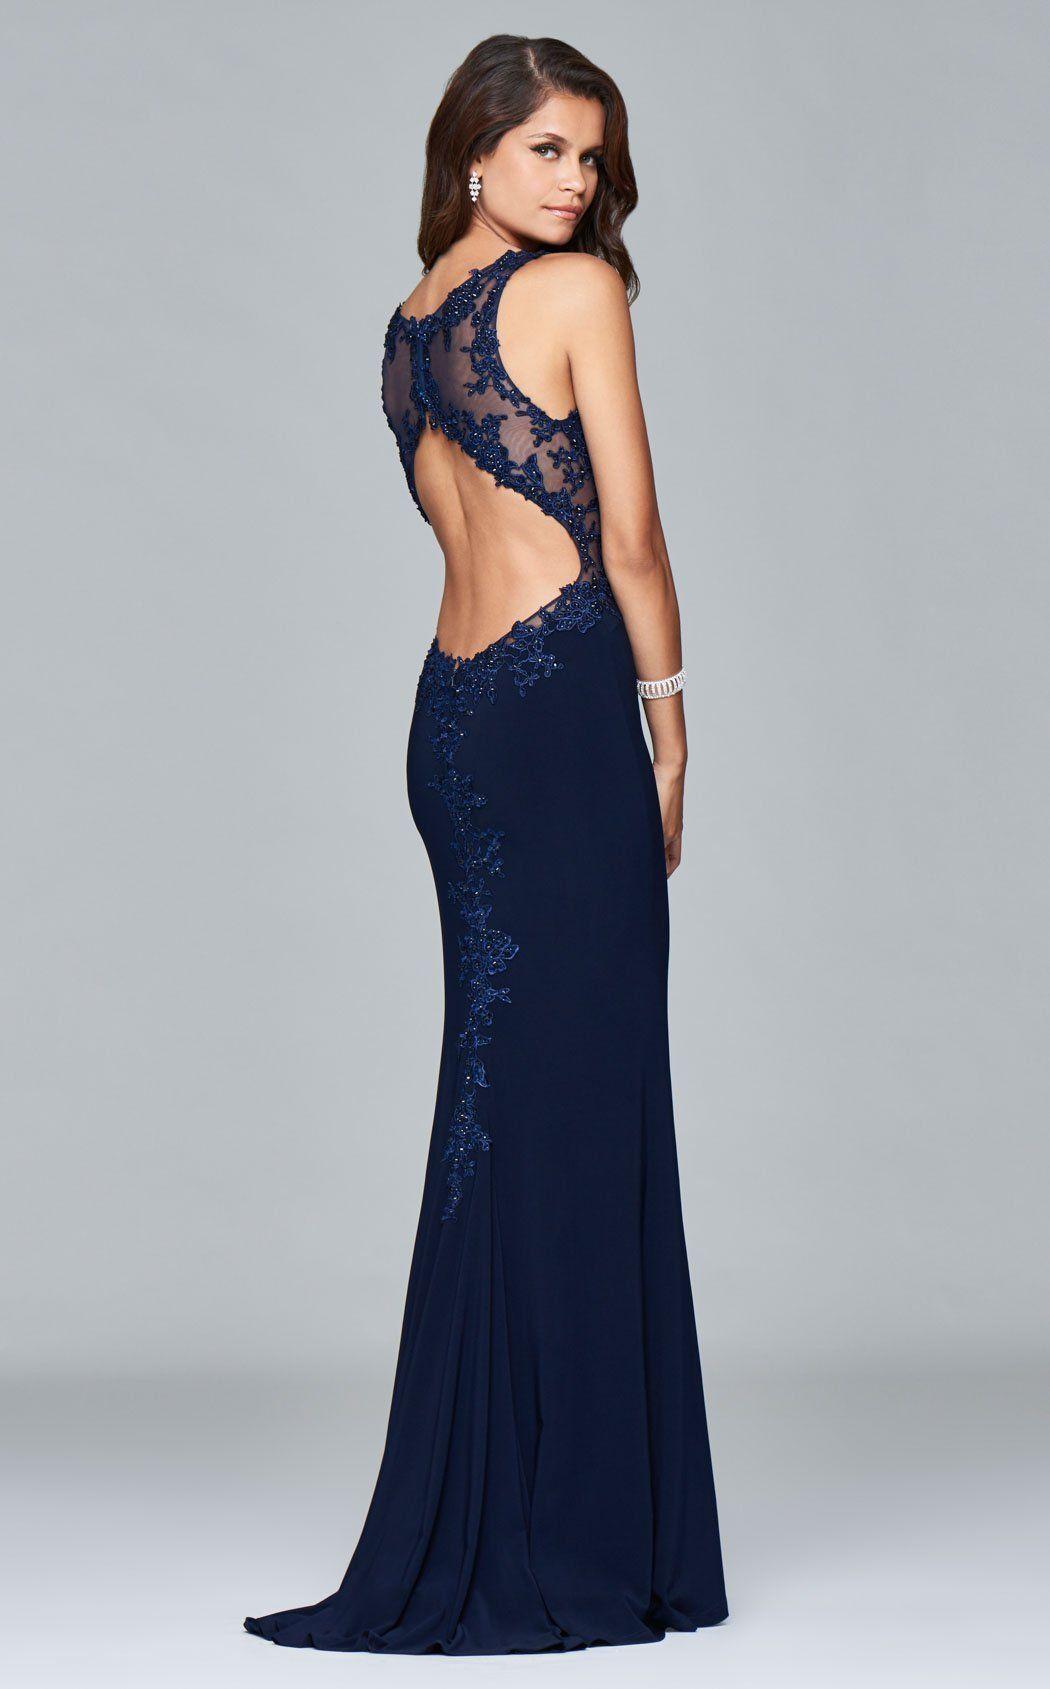 907b73f2e94 Faviana S7999 2016 Homecoming Dresses